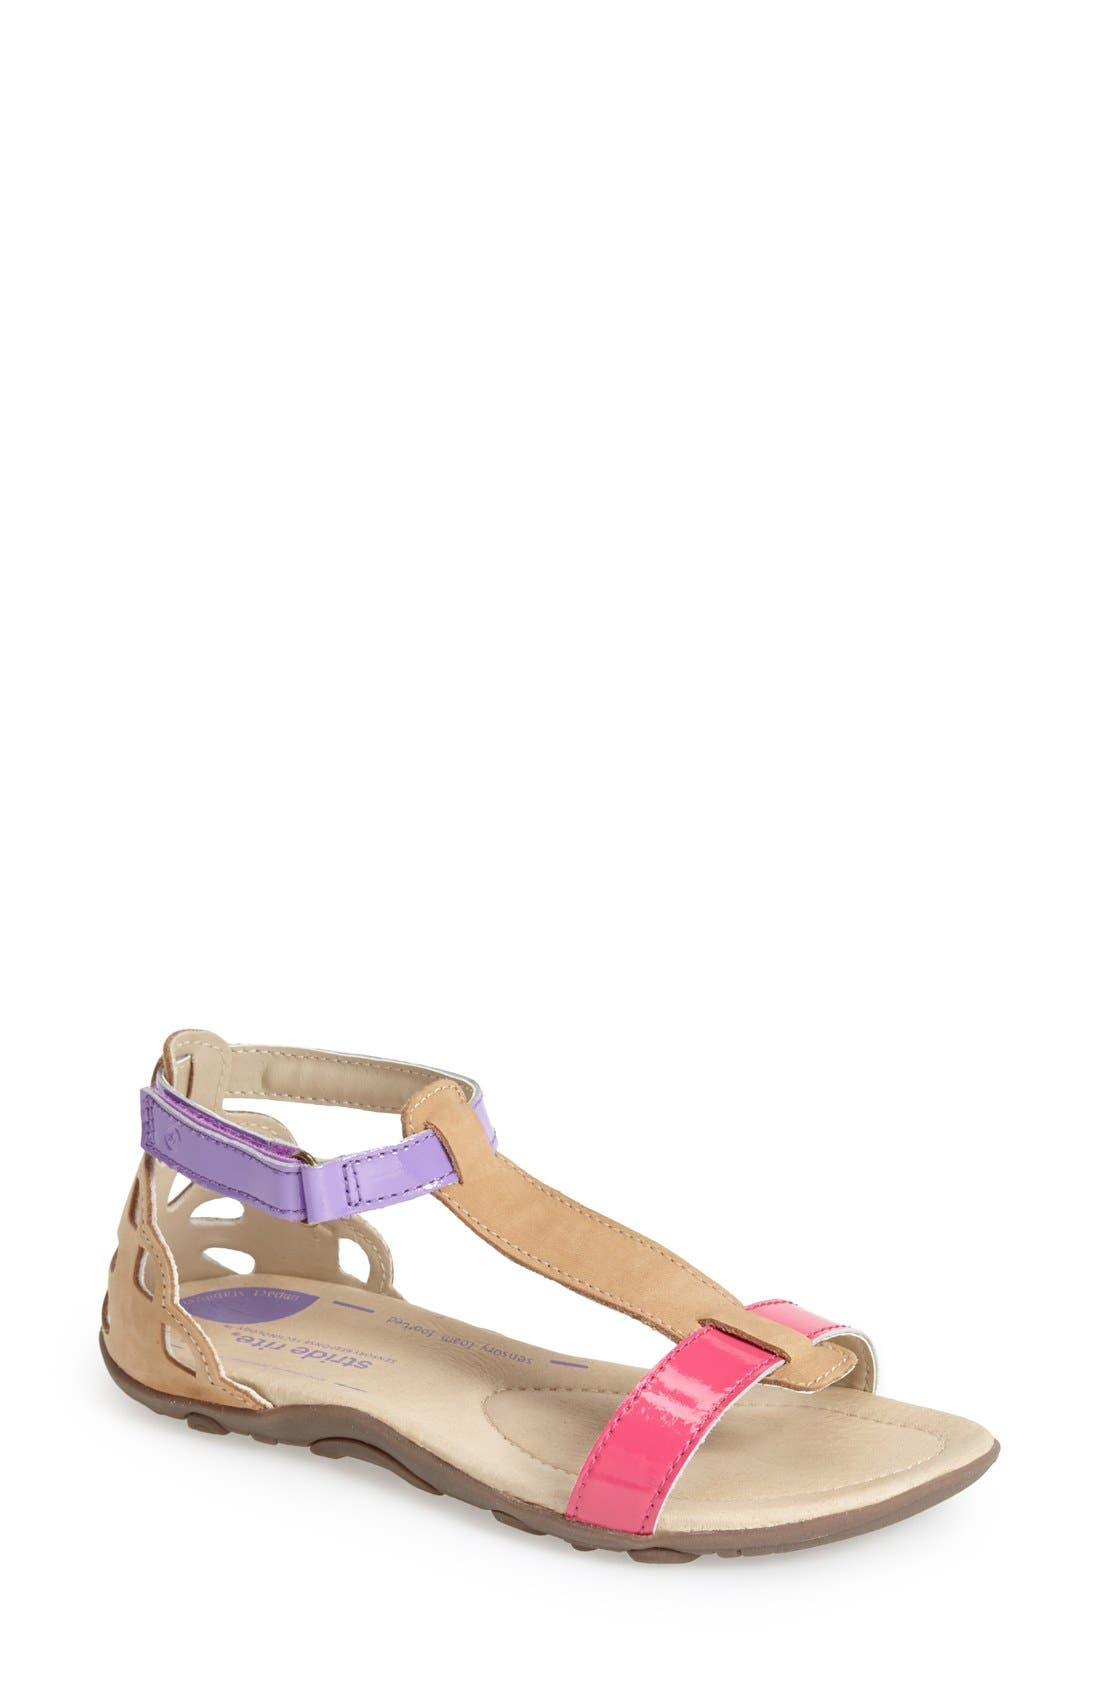 'Poet SRT' Sandal,                         Main,                         color, 236